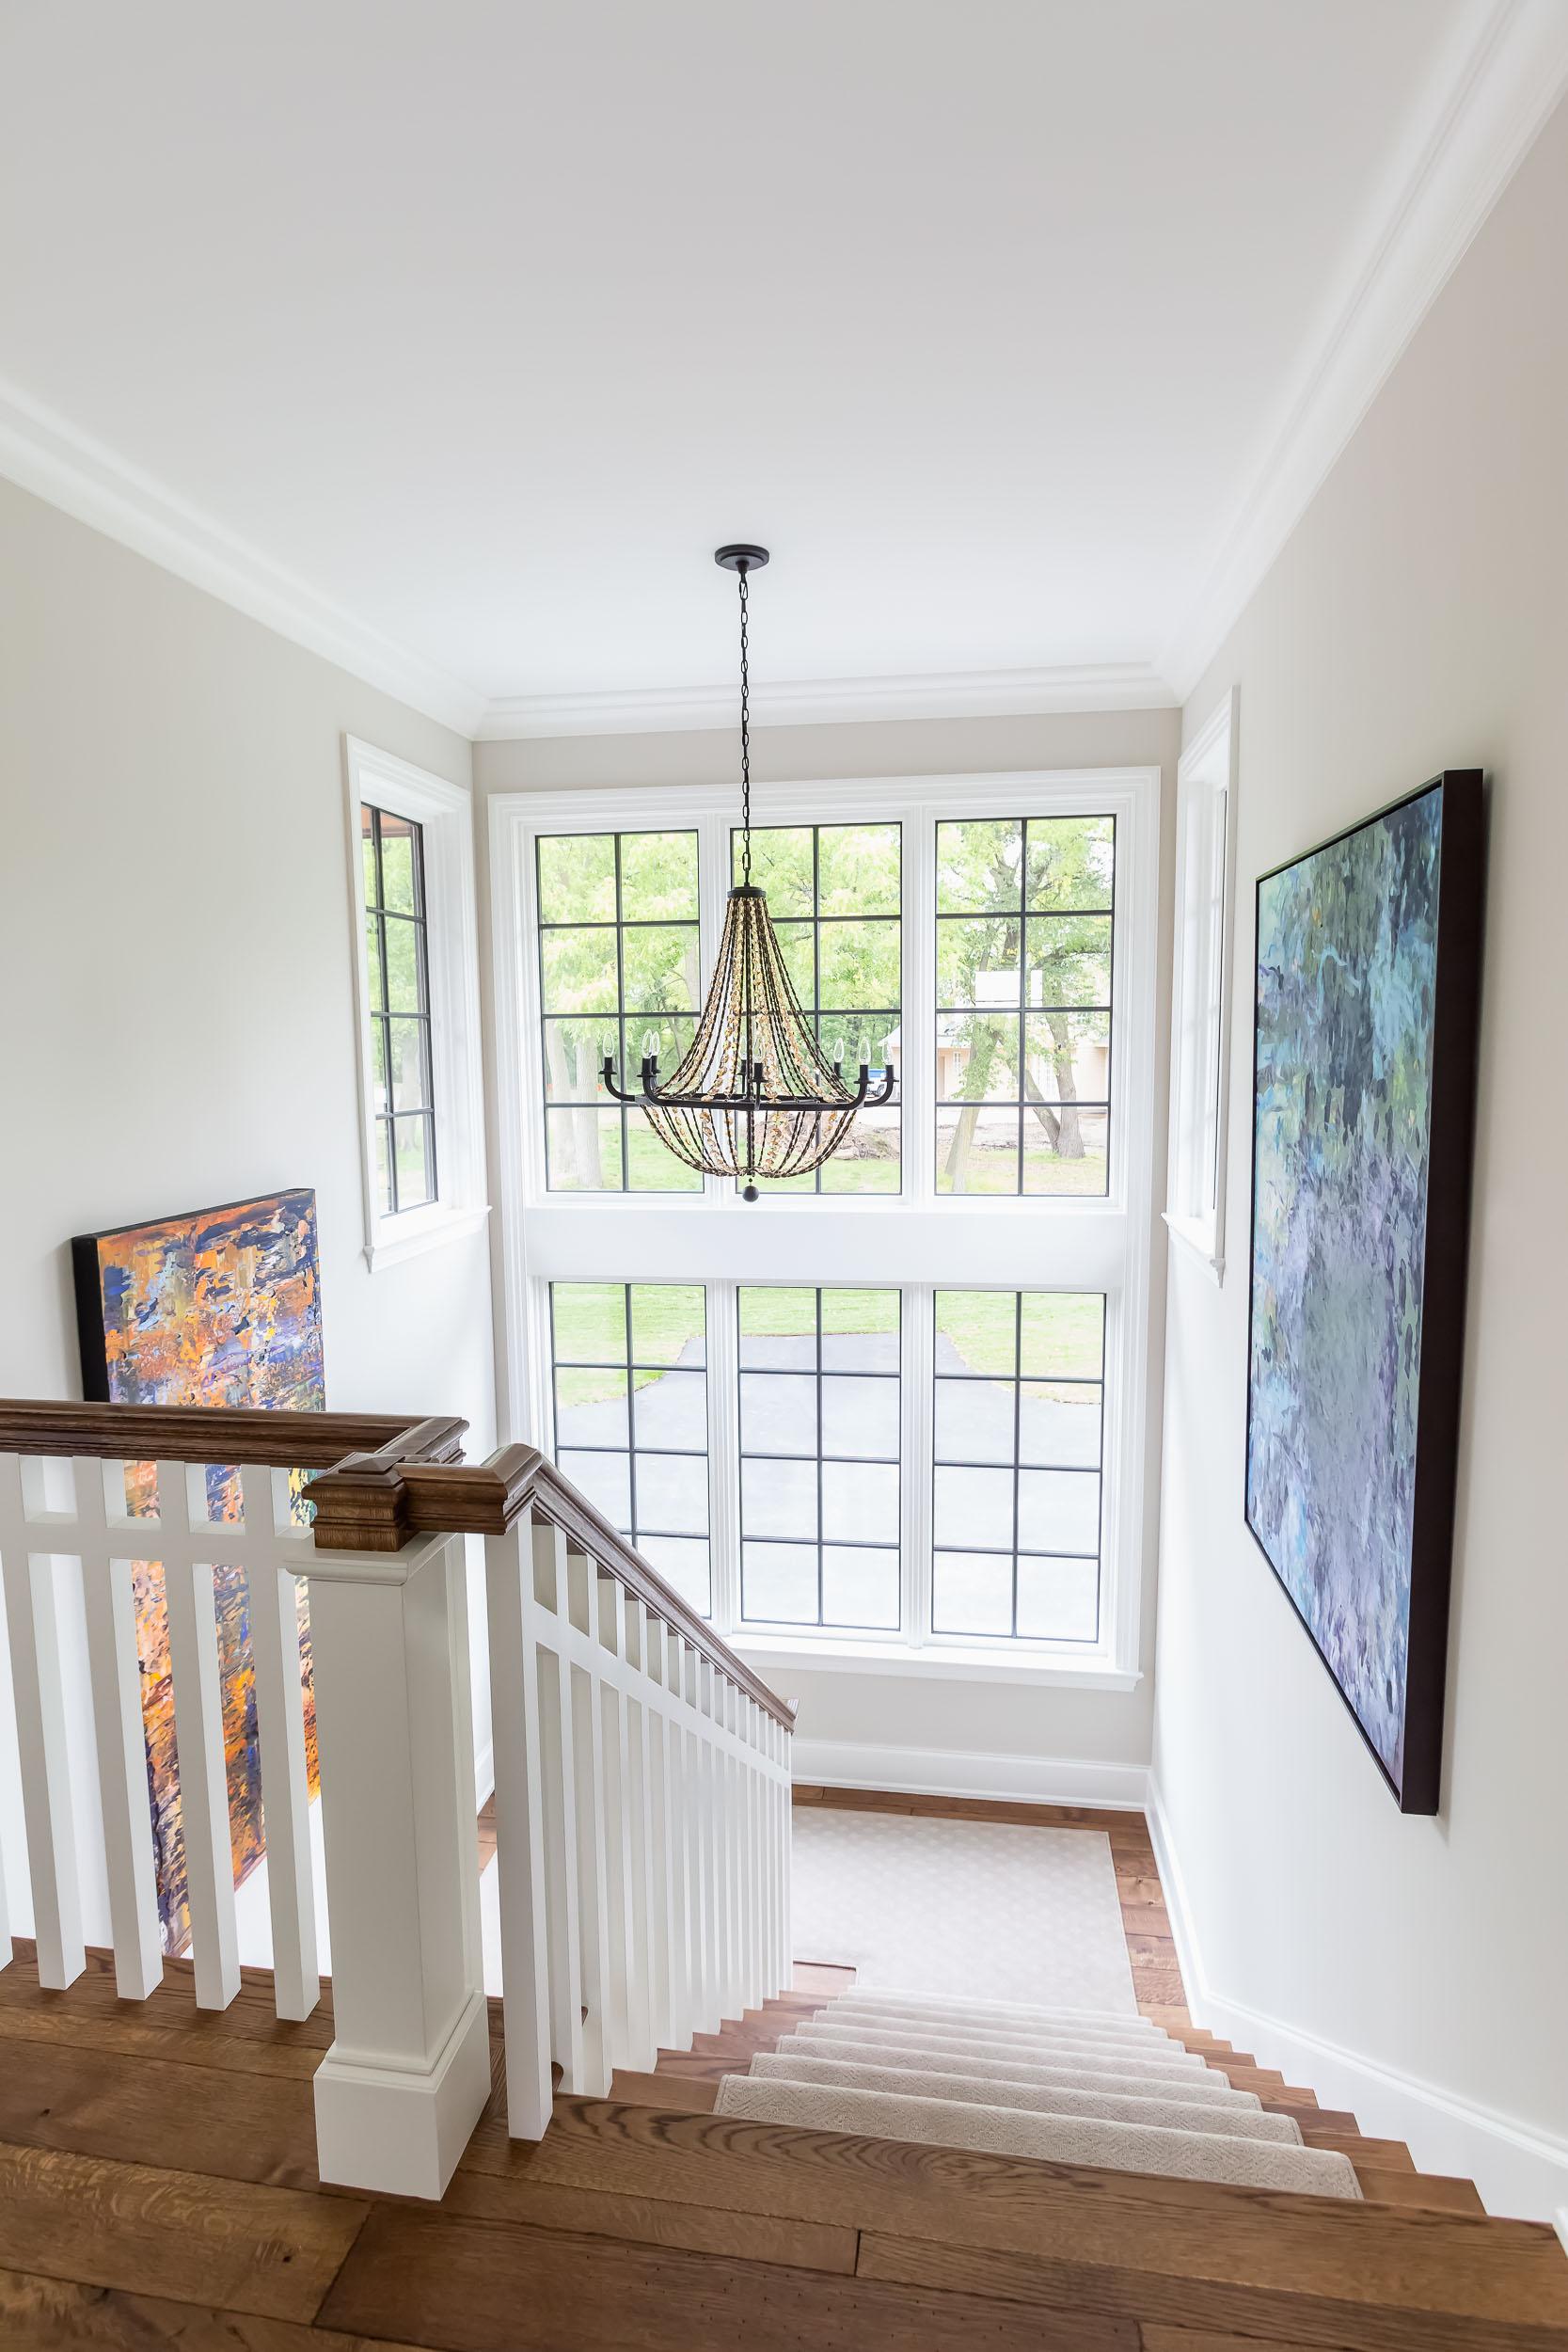 Orono Artisan Home Staircase Image